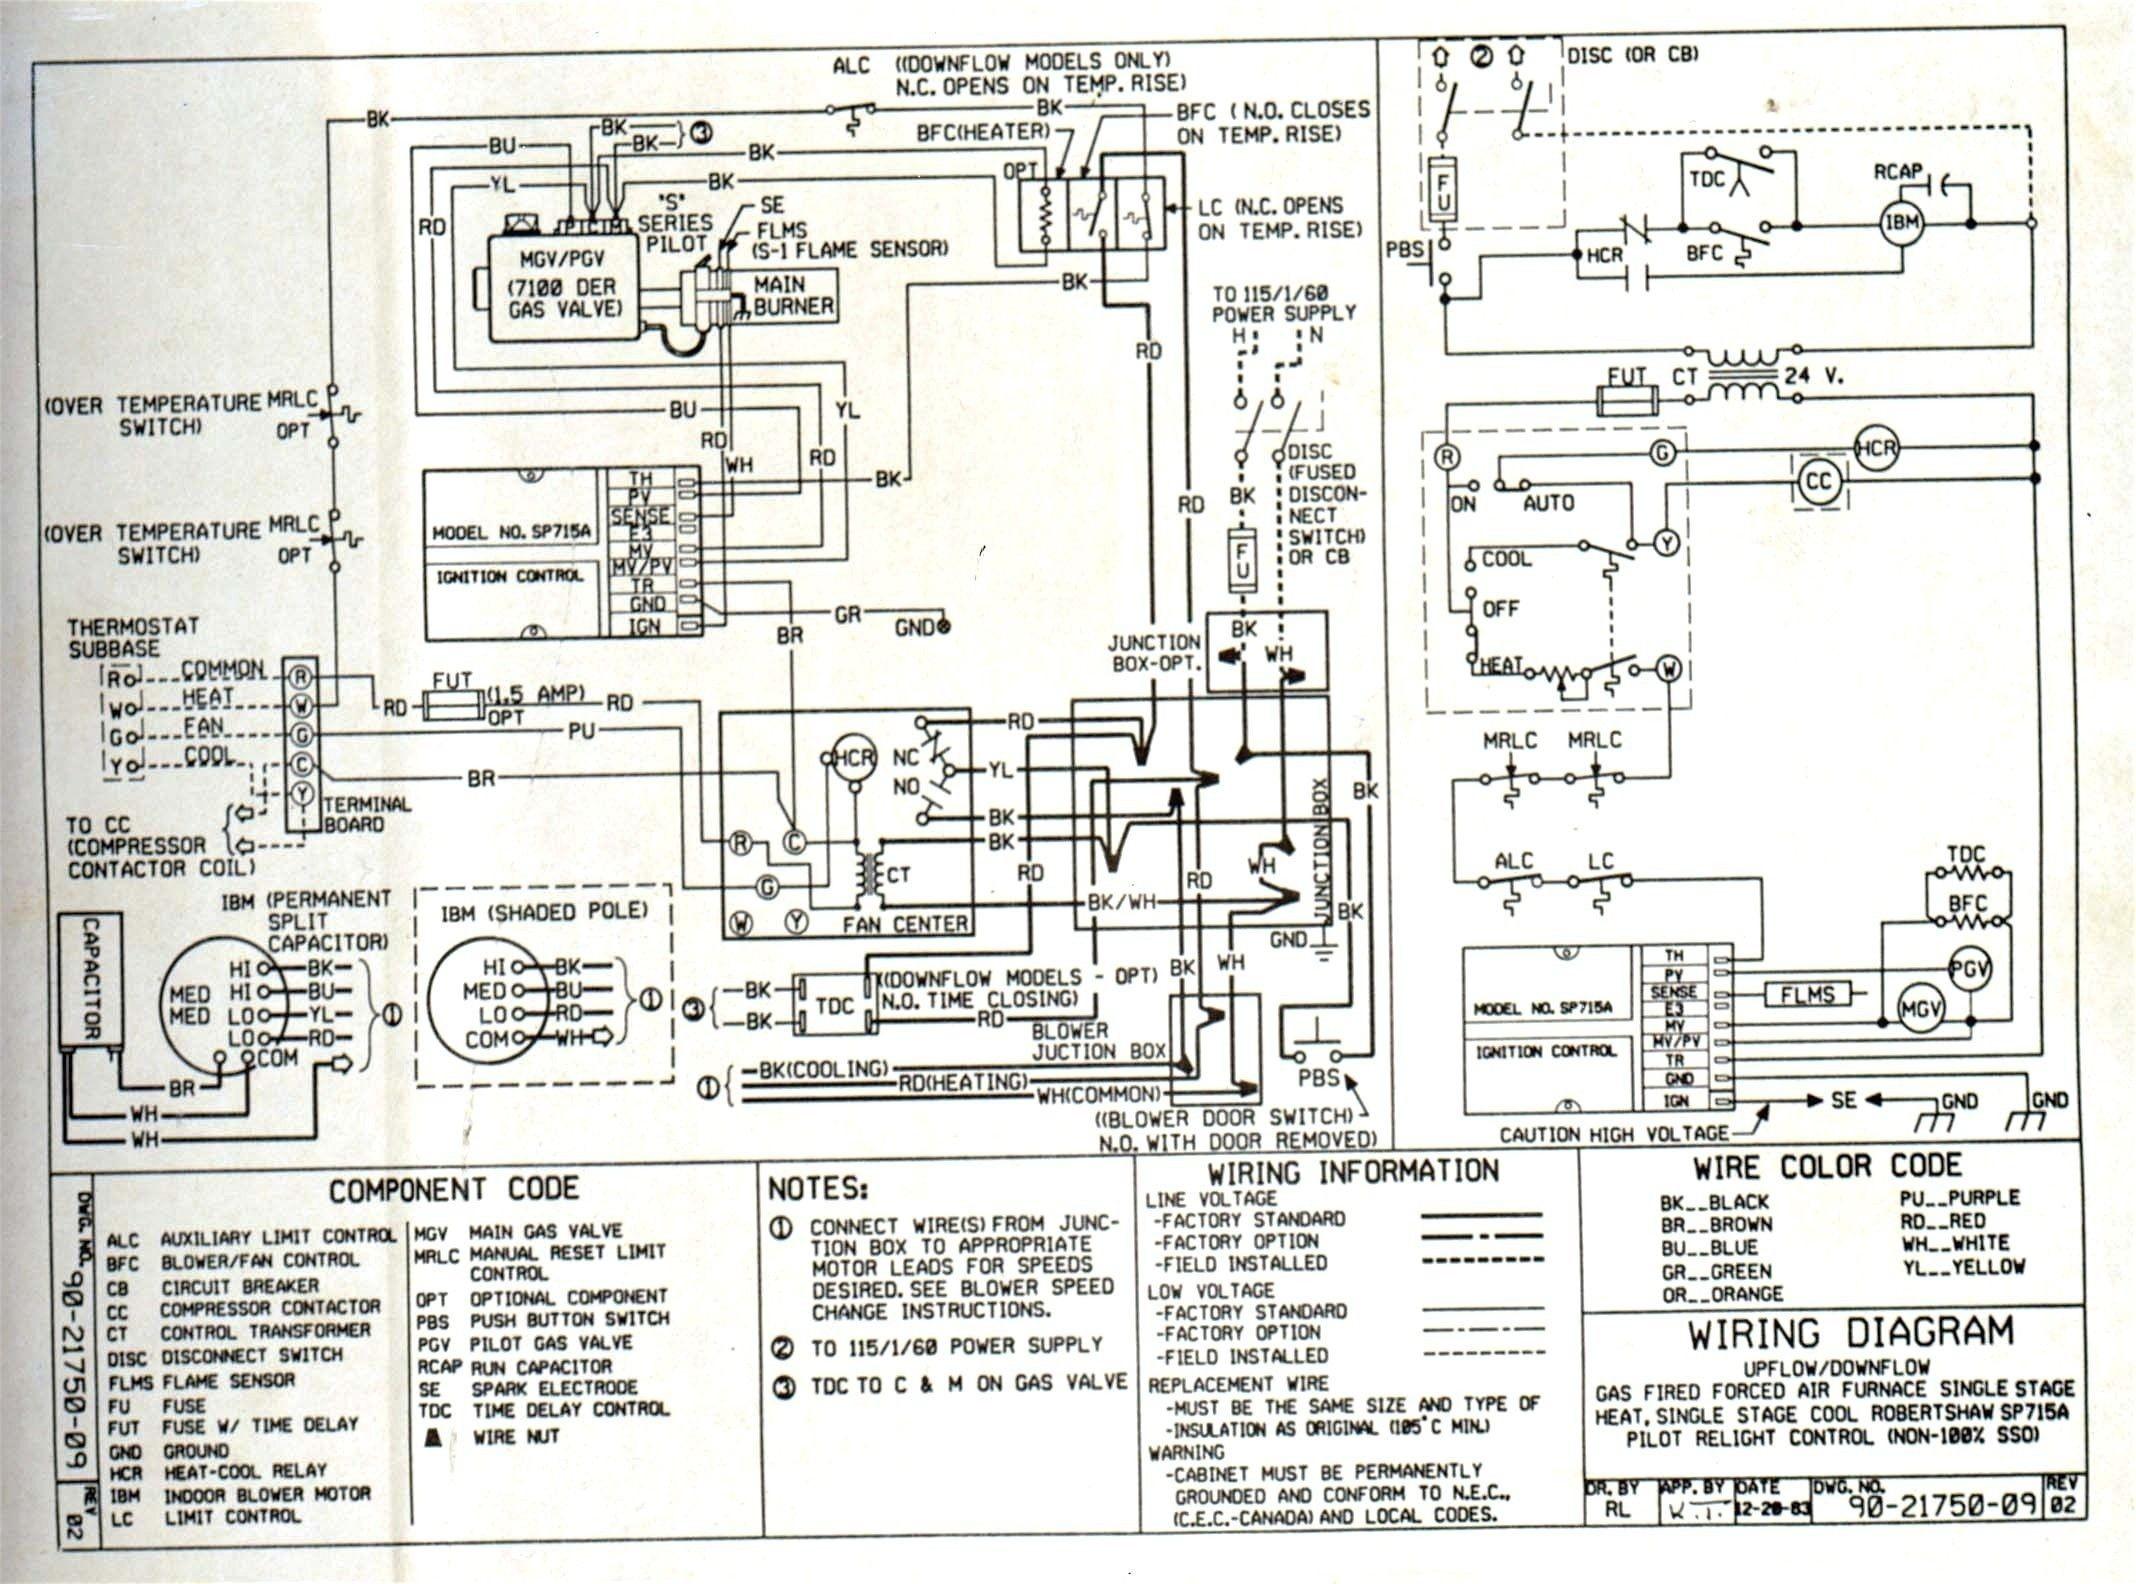 Monarch Dump Motor Wiring Diagram Unique Panel Wiring Diagram Diagram Wiringdiagram Of Monarch Dump Motor Wiring Diagram Bucher Hydraulics Wiring Diagram